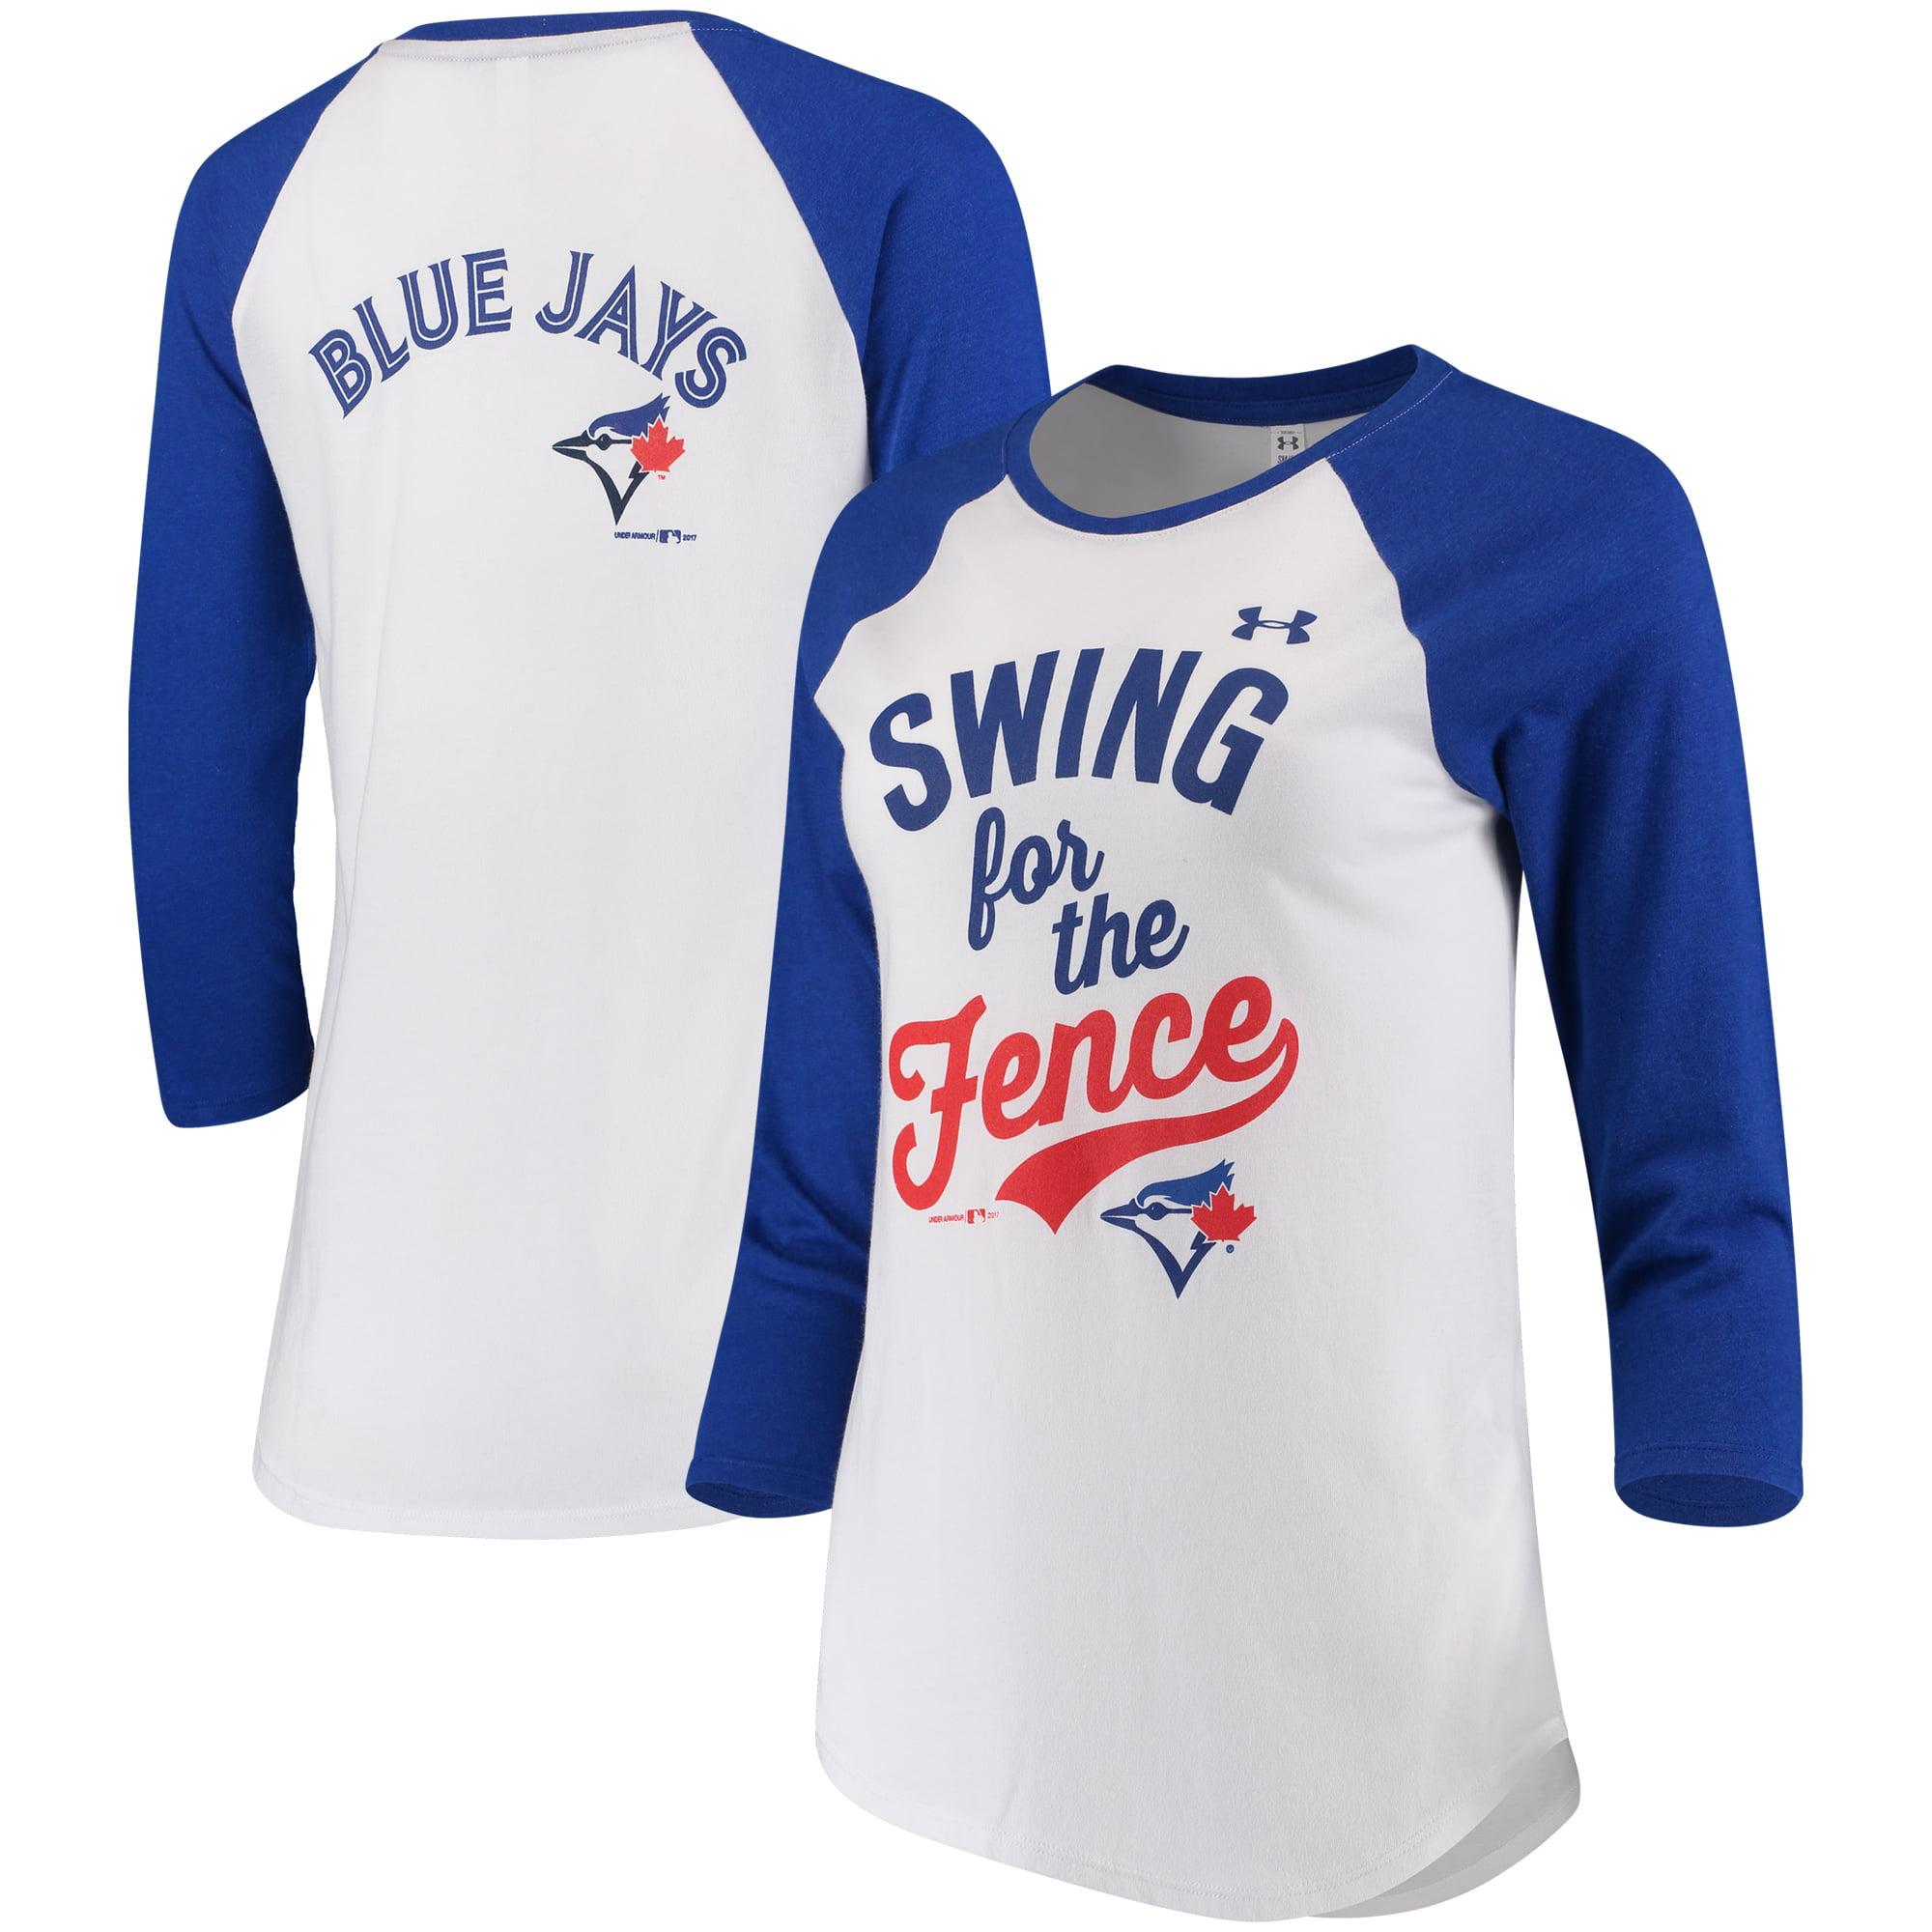 Toronto Blue Jays Under Armour Women's Baseball 3/4-Sleeve T-Shirt - White